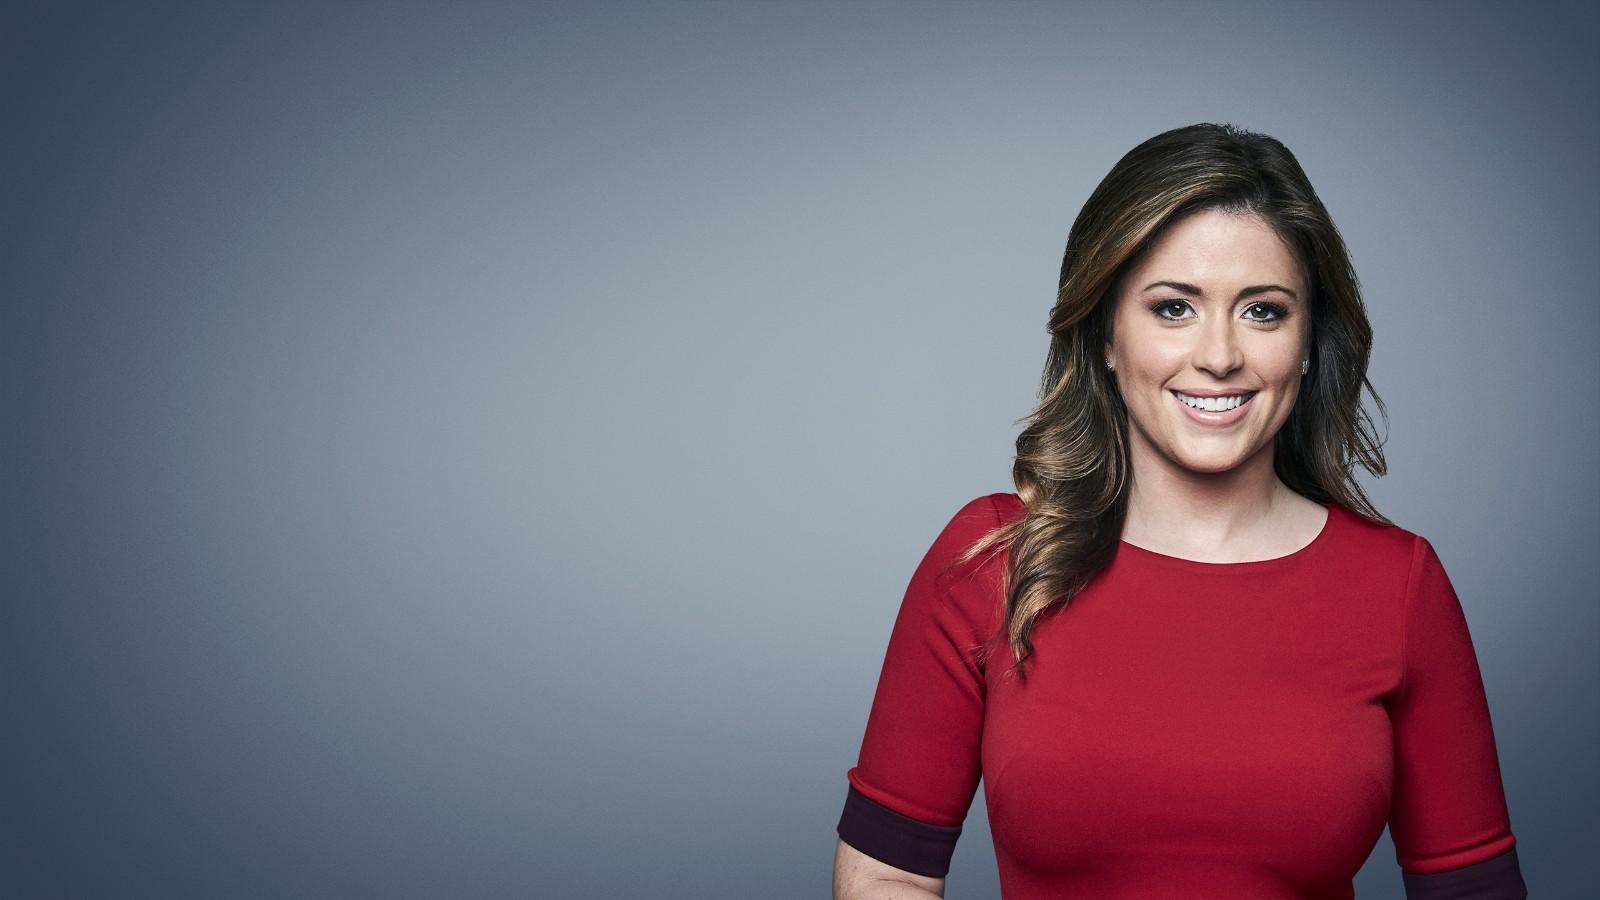 CNN Profiles - Chloe Melas - Entertainment Reporter - CNN.com